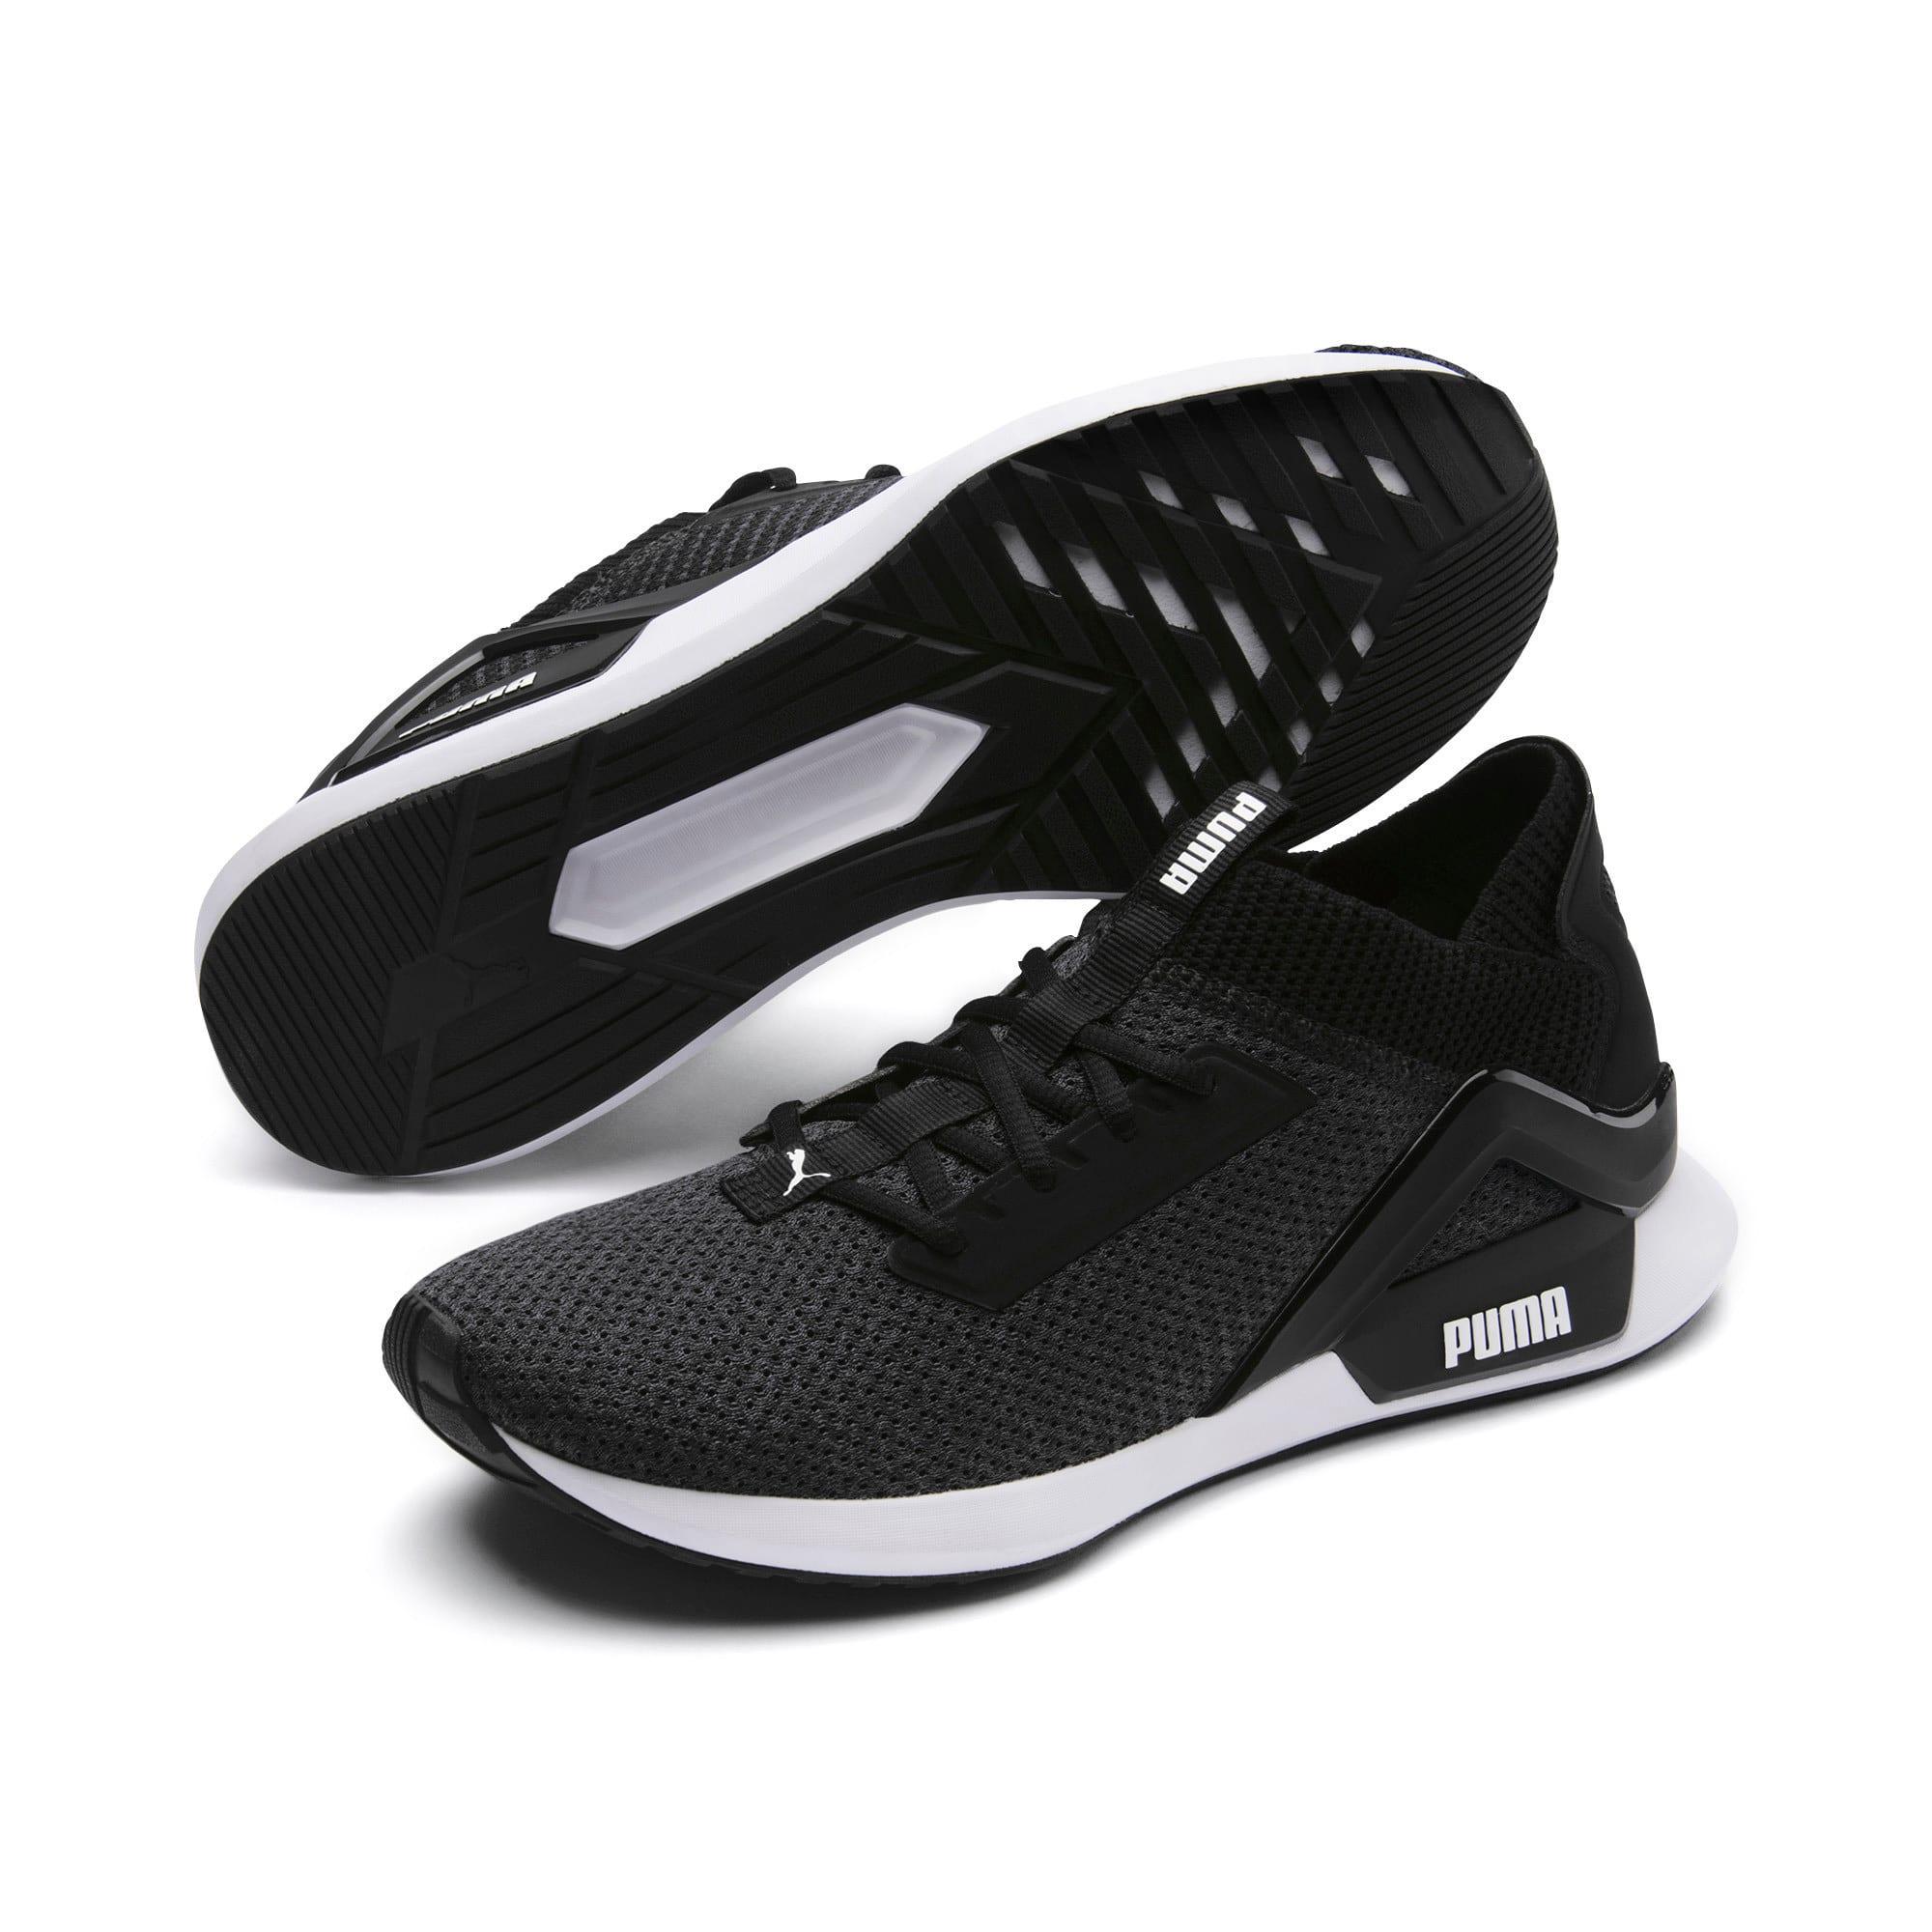 Thumbnail 2 of Rogue Men's Running Shoes, Puma Black, medium